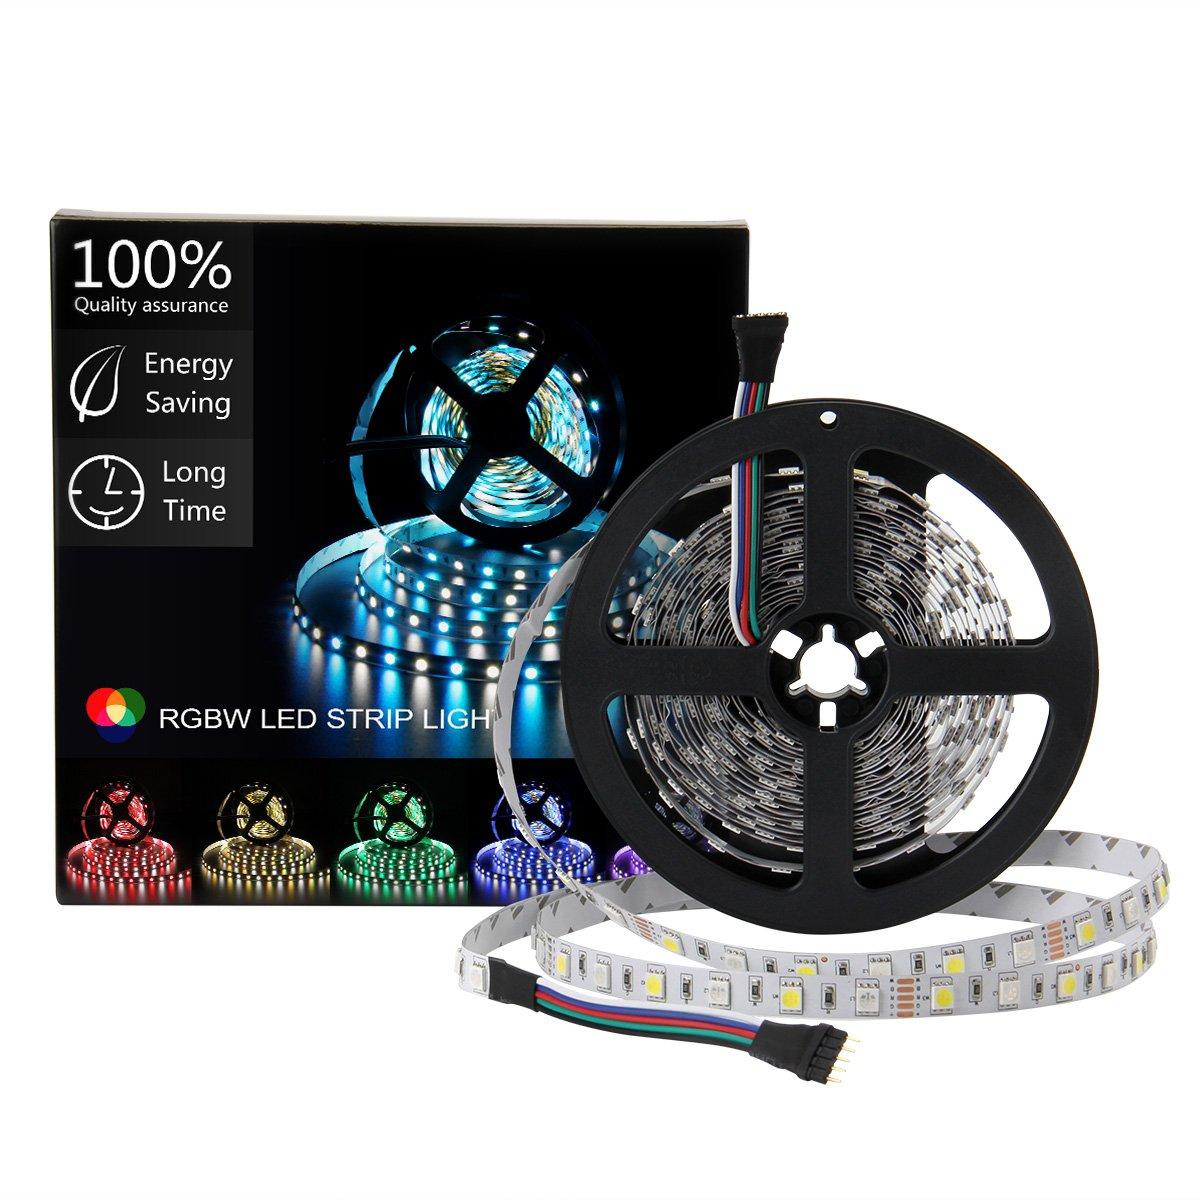 SUPERNIGHT LED Strip Light, 5050 16.4ft RGBW Non-waterproof LED Flexible Lighting, 12V 300LEDs, 5M Multi-colored LED Tape Lights -